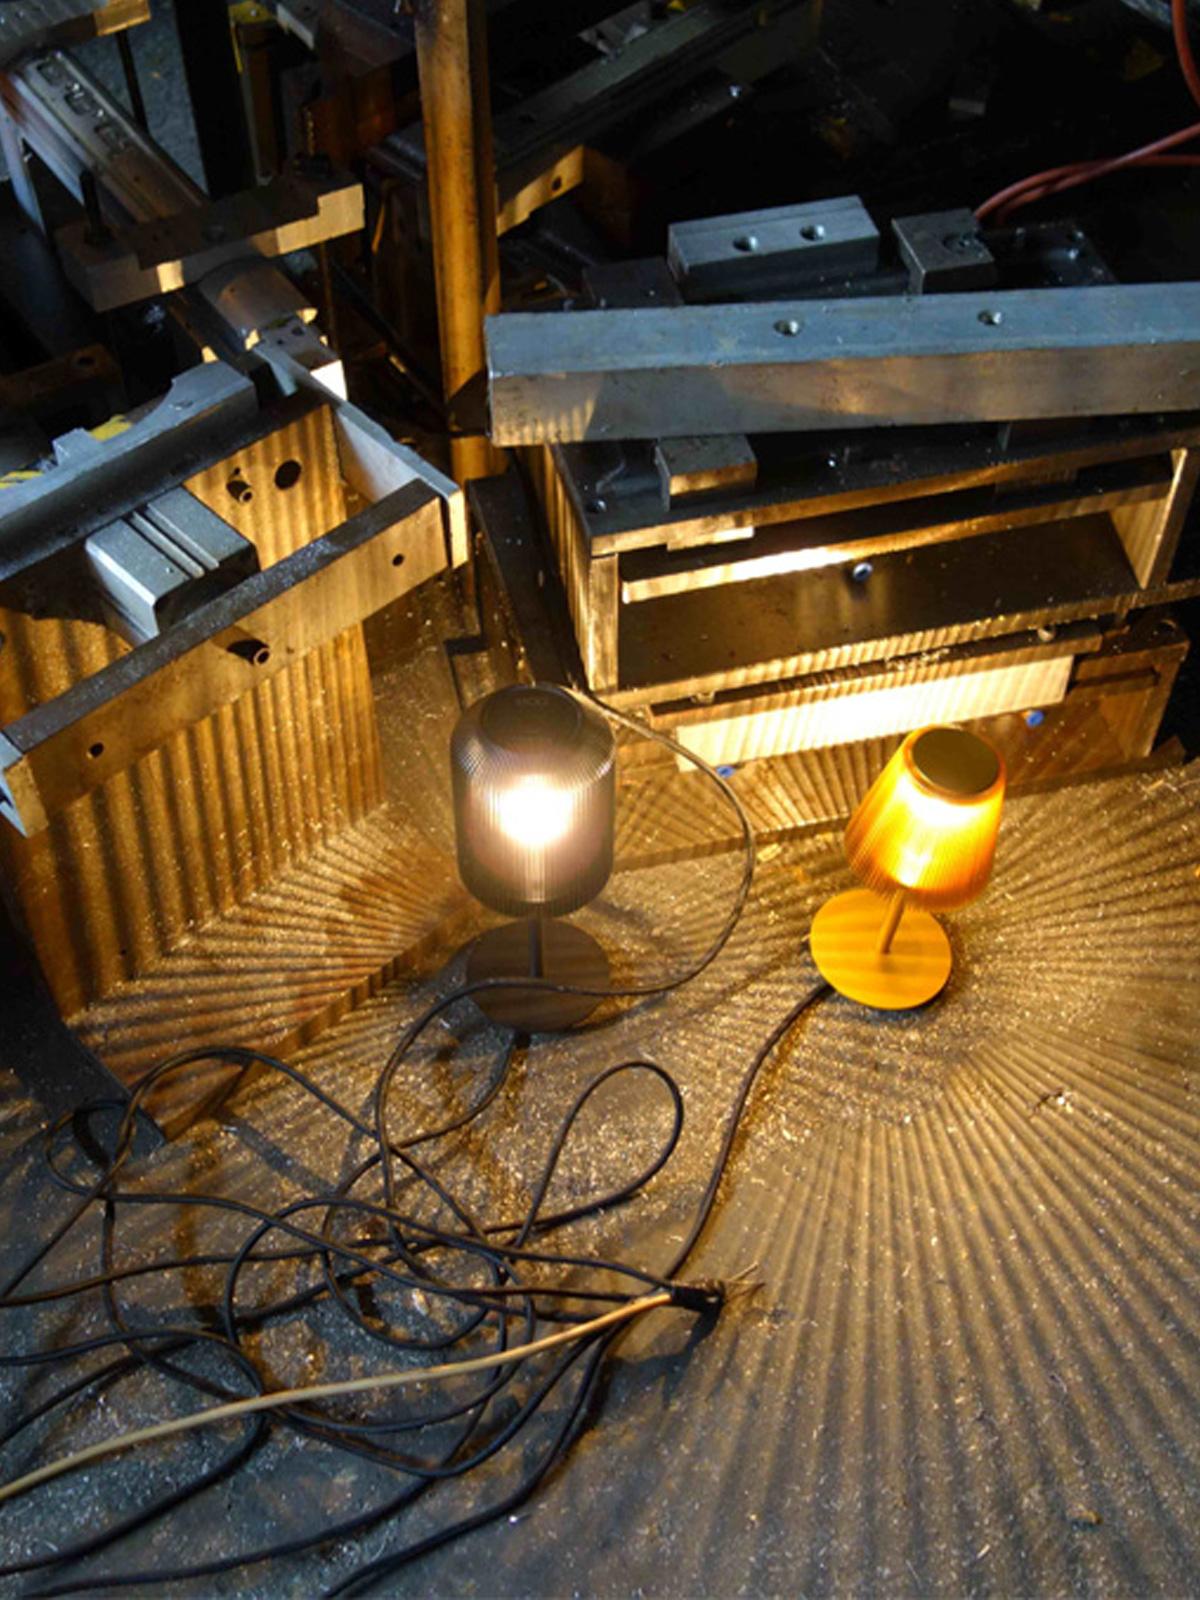 DesignOrt Blog: Schattenspiele Bramah und Joseph Lampen eoq aus Aluminium